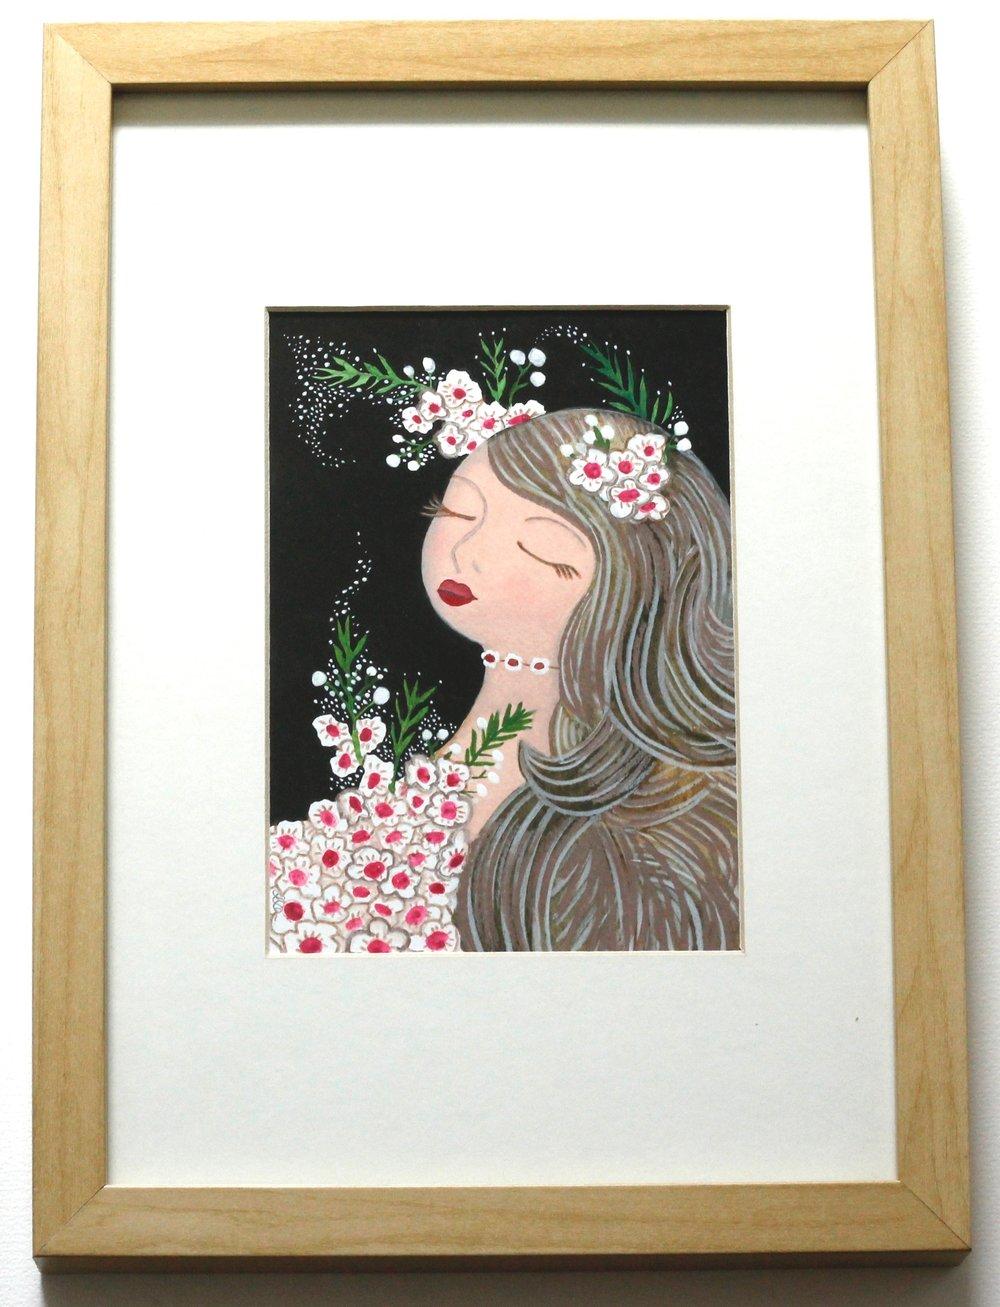 Flower Dream - 12x17cm gouache and pencil on paper €60